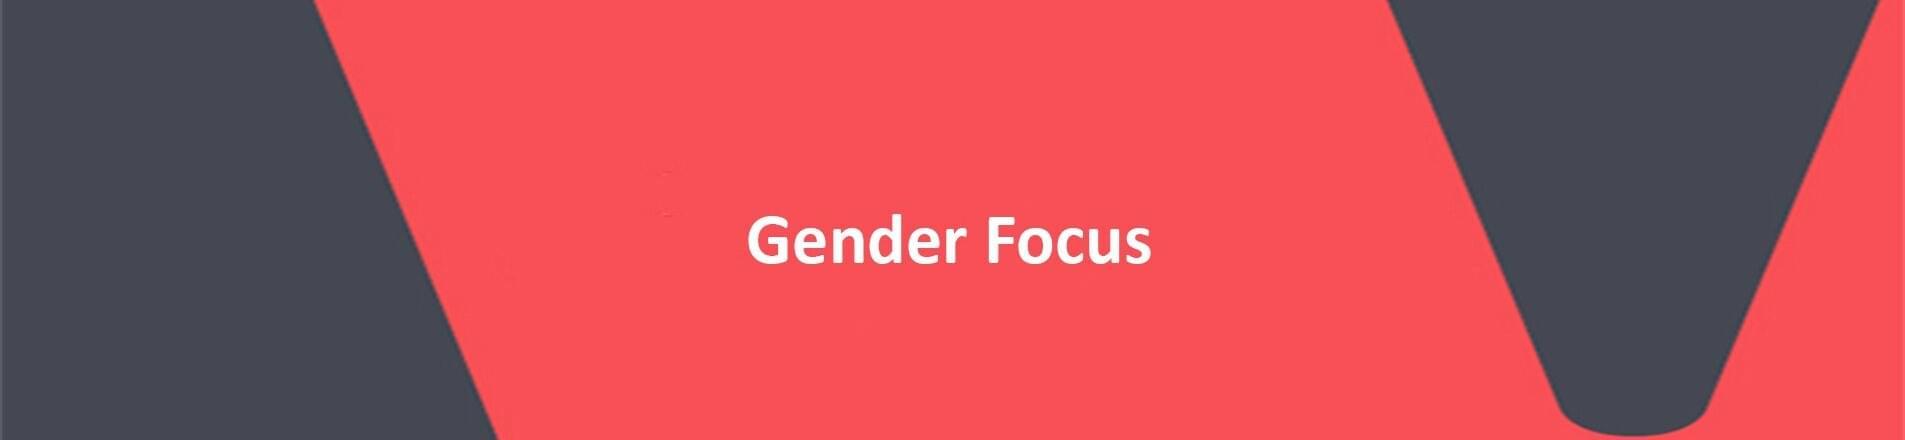 The words 'Gender Focus' on red VERCIDA background